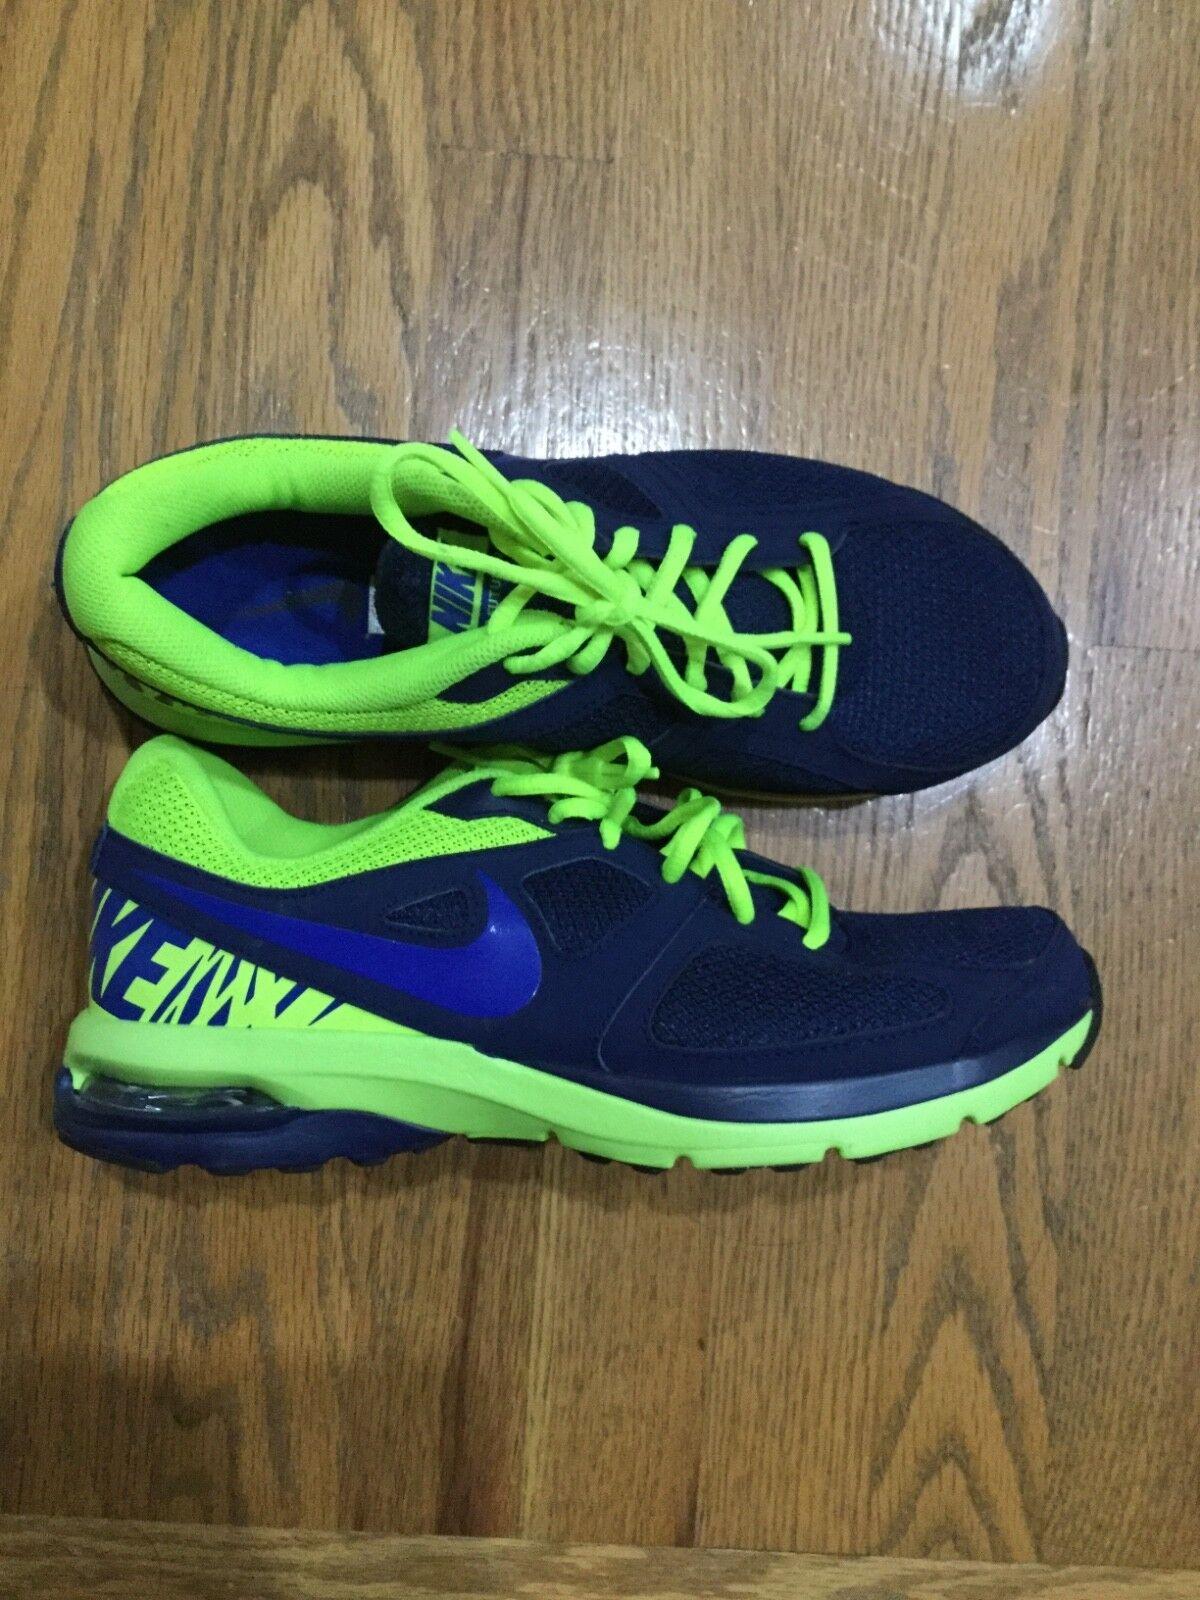 New Nike Air Futurun Running Fitness Crossfit MarathonRunning Shoes Men Comfortable Cheap women's shoes women's shoes